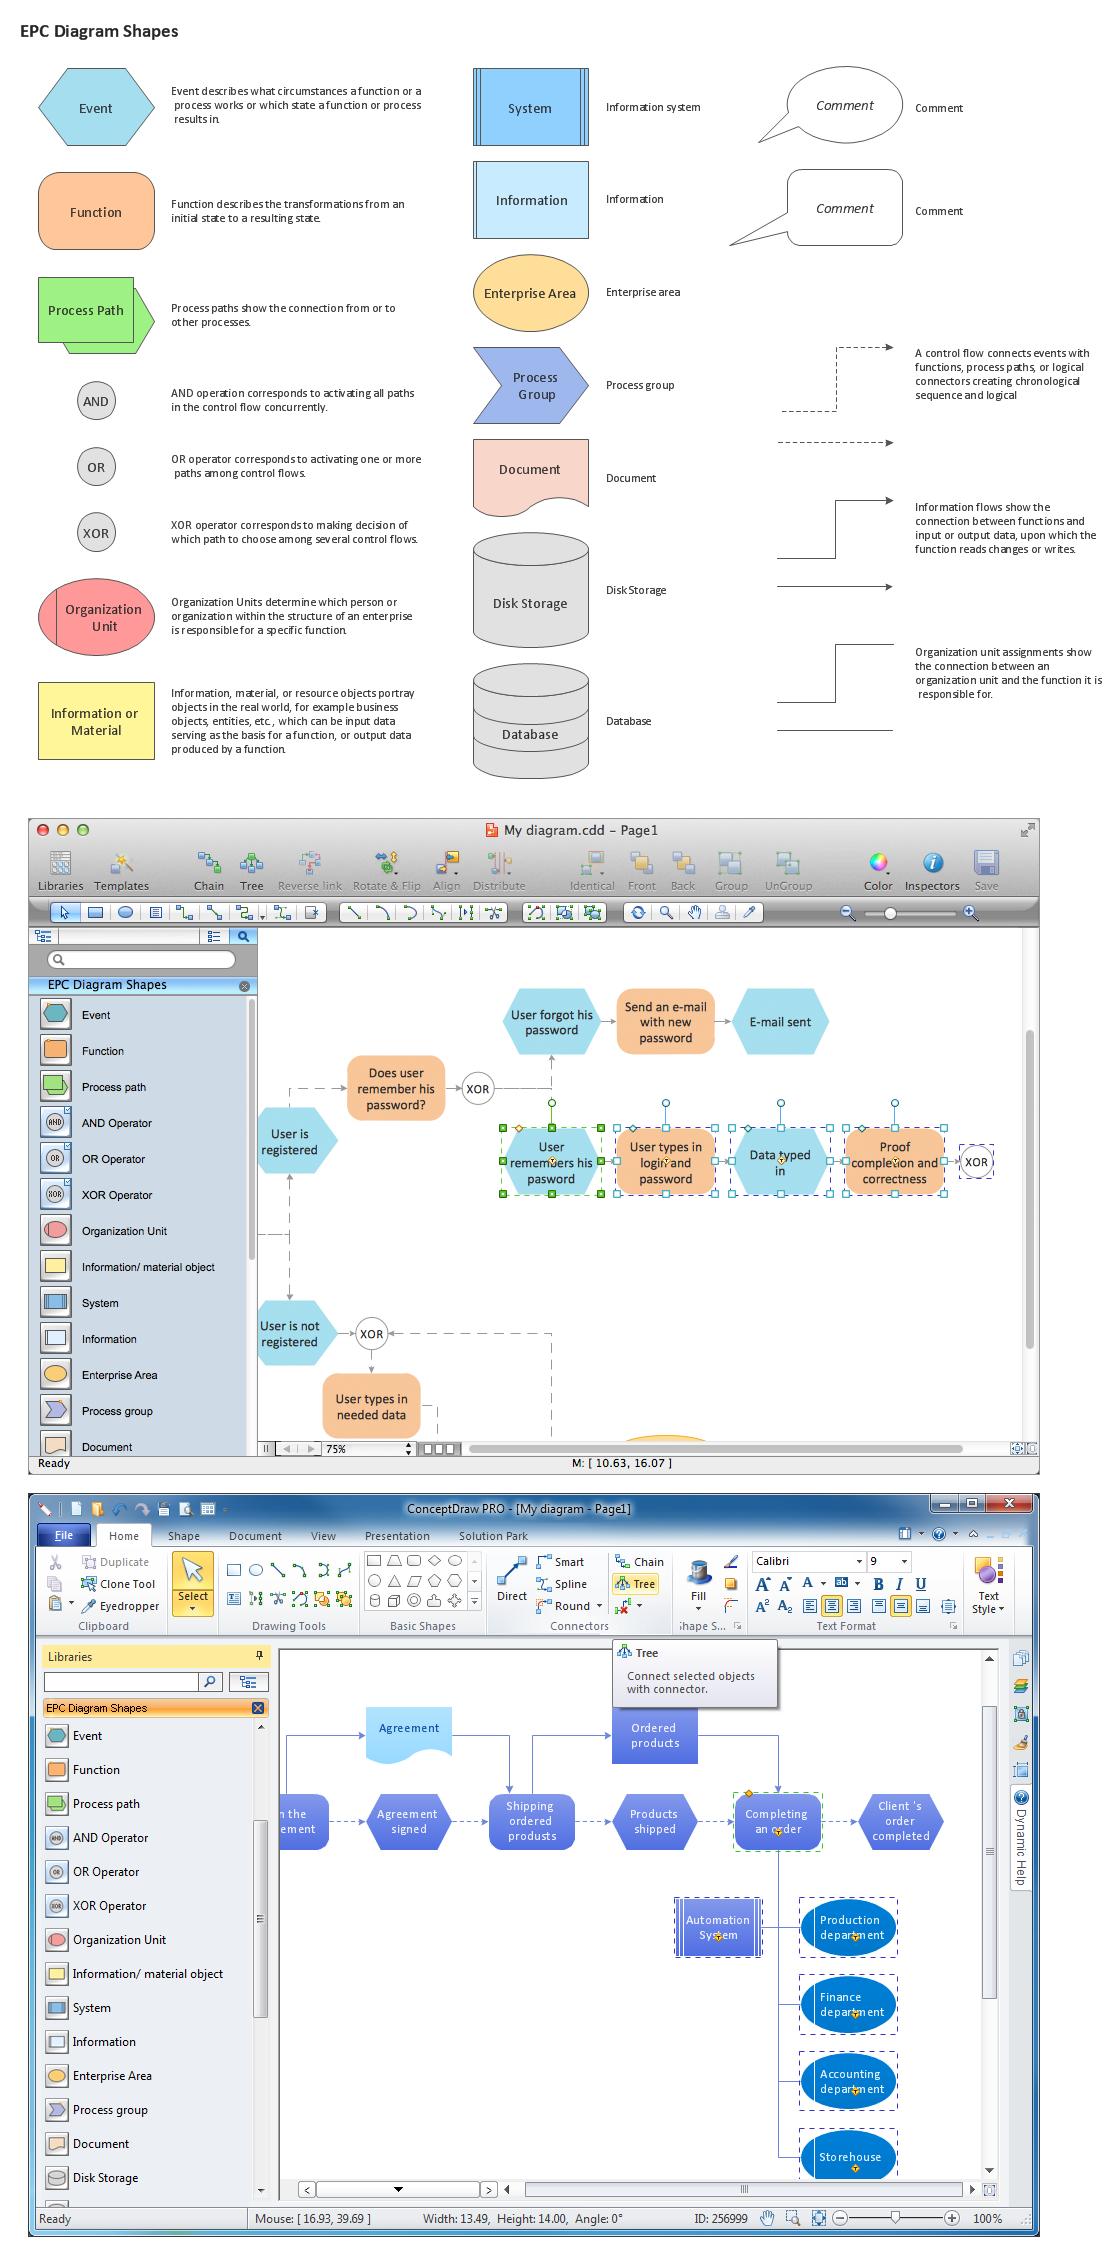 Design elements for EPC diagrams (Win, Mac)